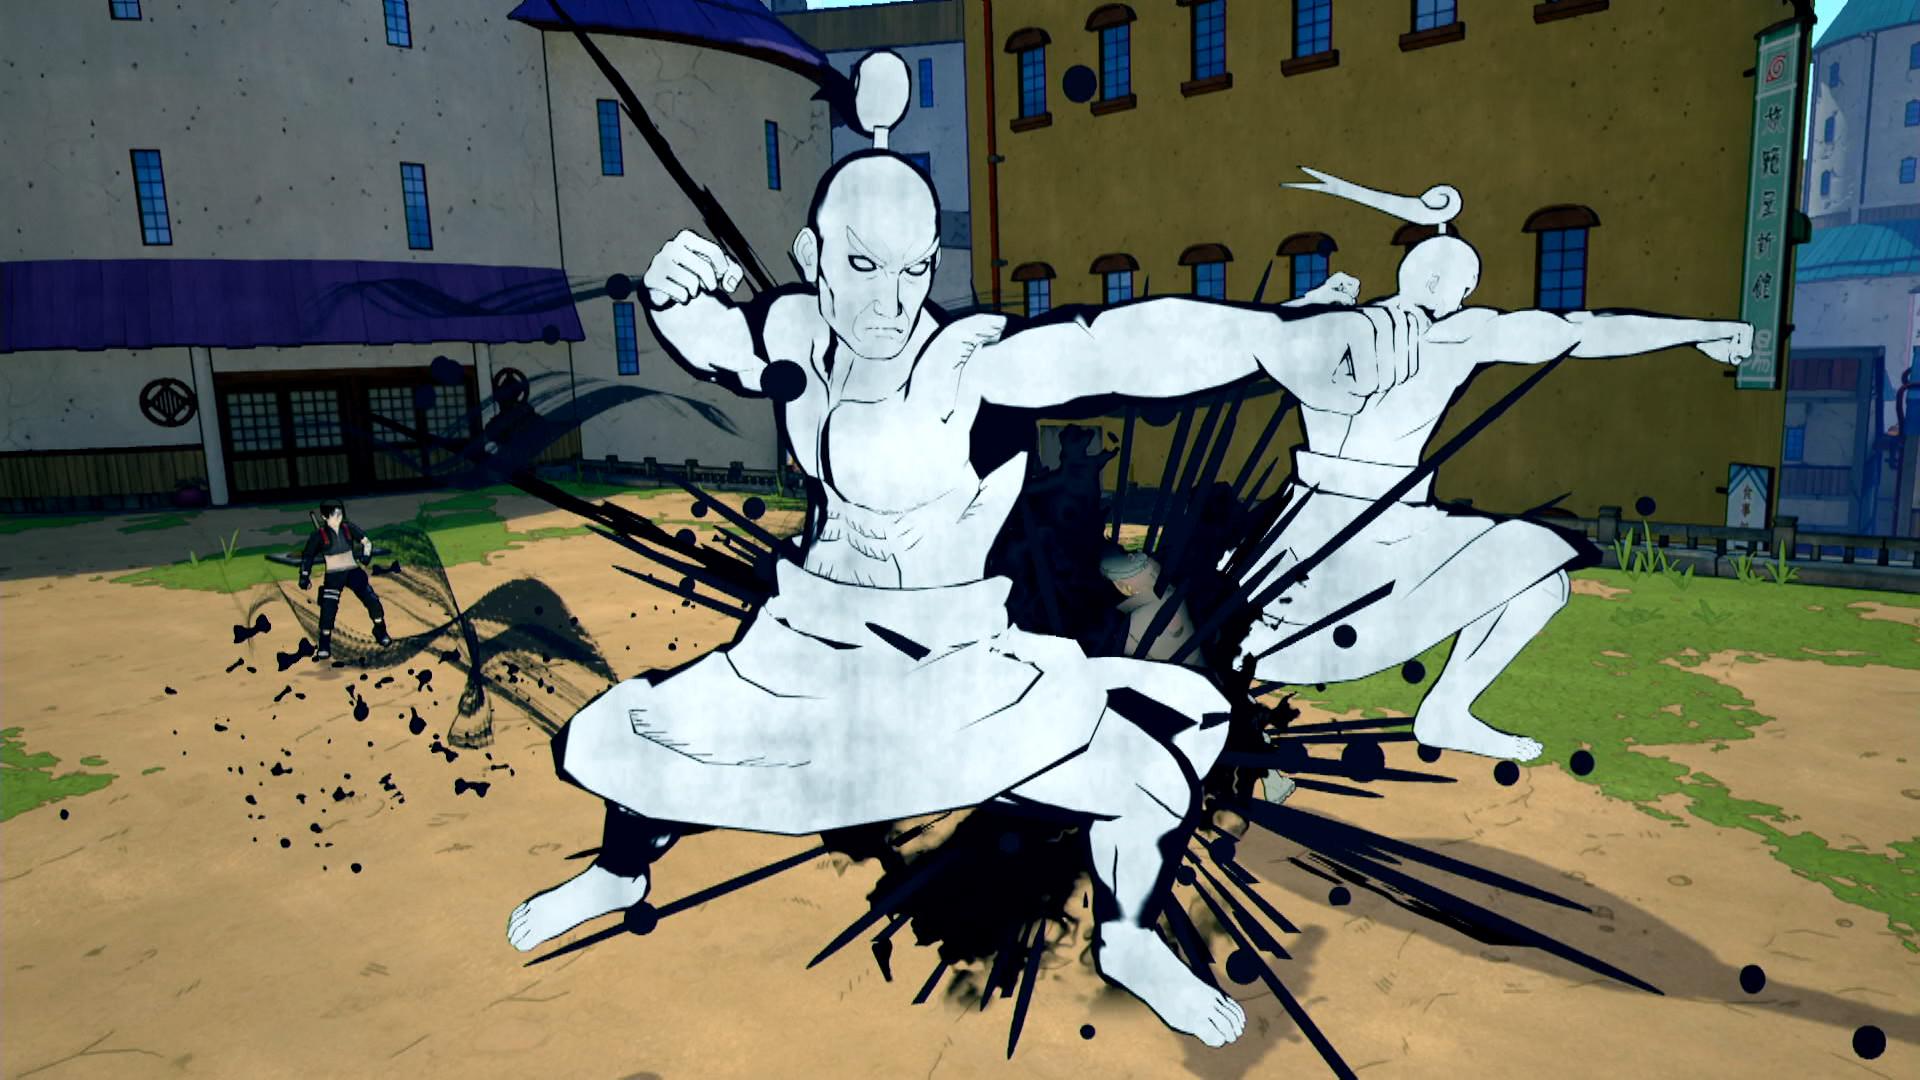 Naruto to Boruto Shinobi Striker Deluxe Edition PC clé pas cher à télécharger